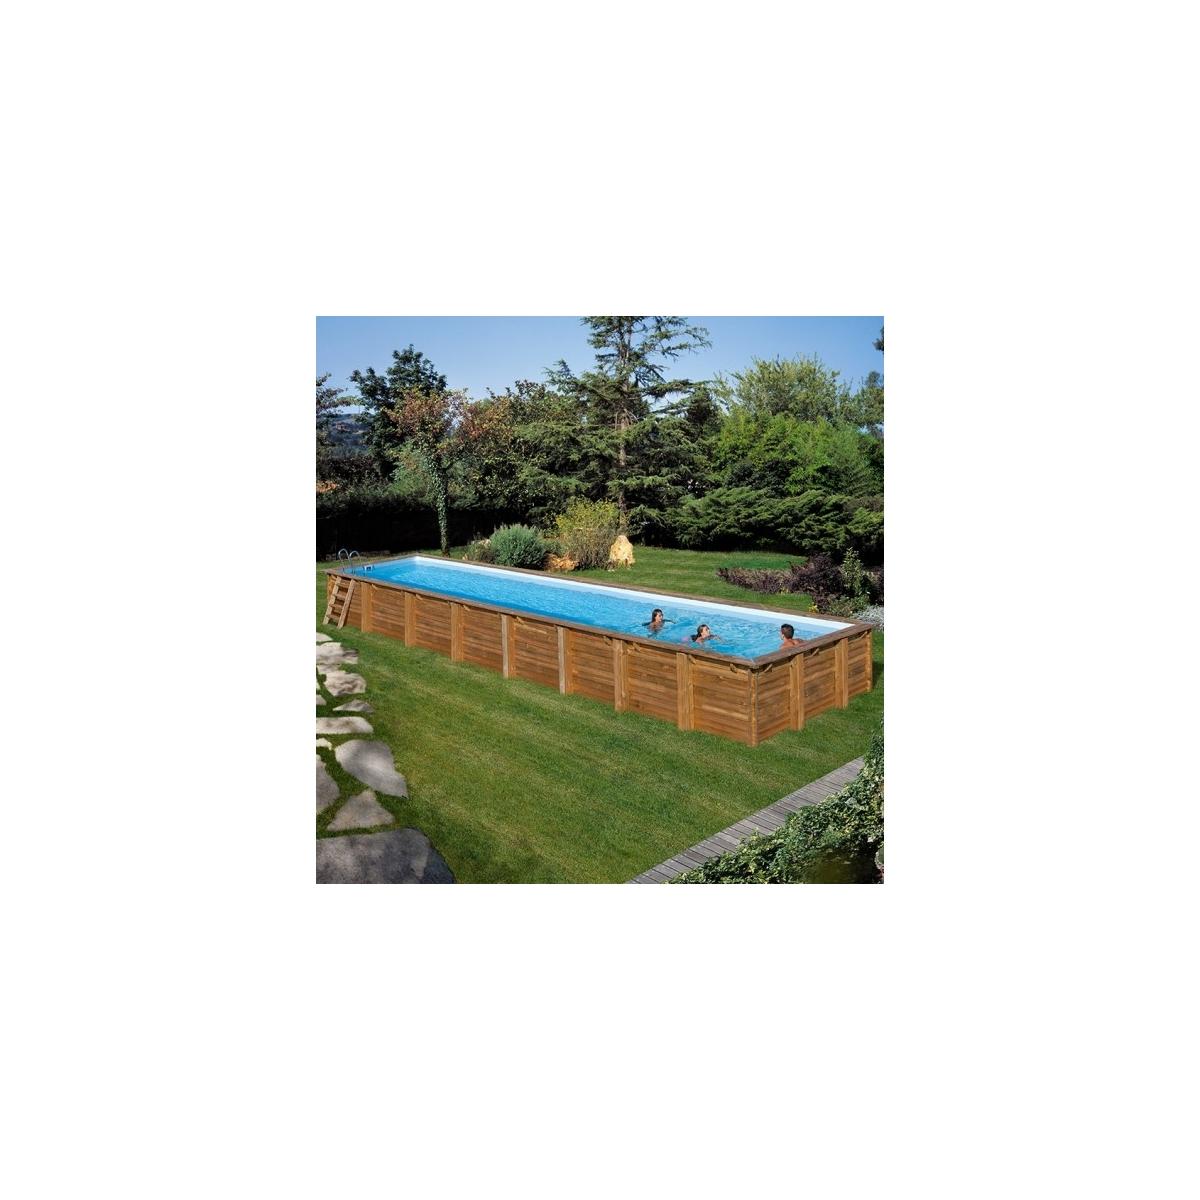 Piscina desmontable de madera Gre Sunbay Cardamon rectangular 1210x418x146